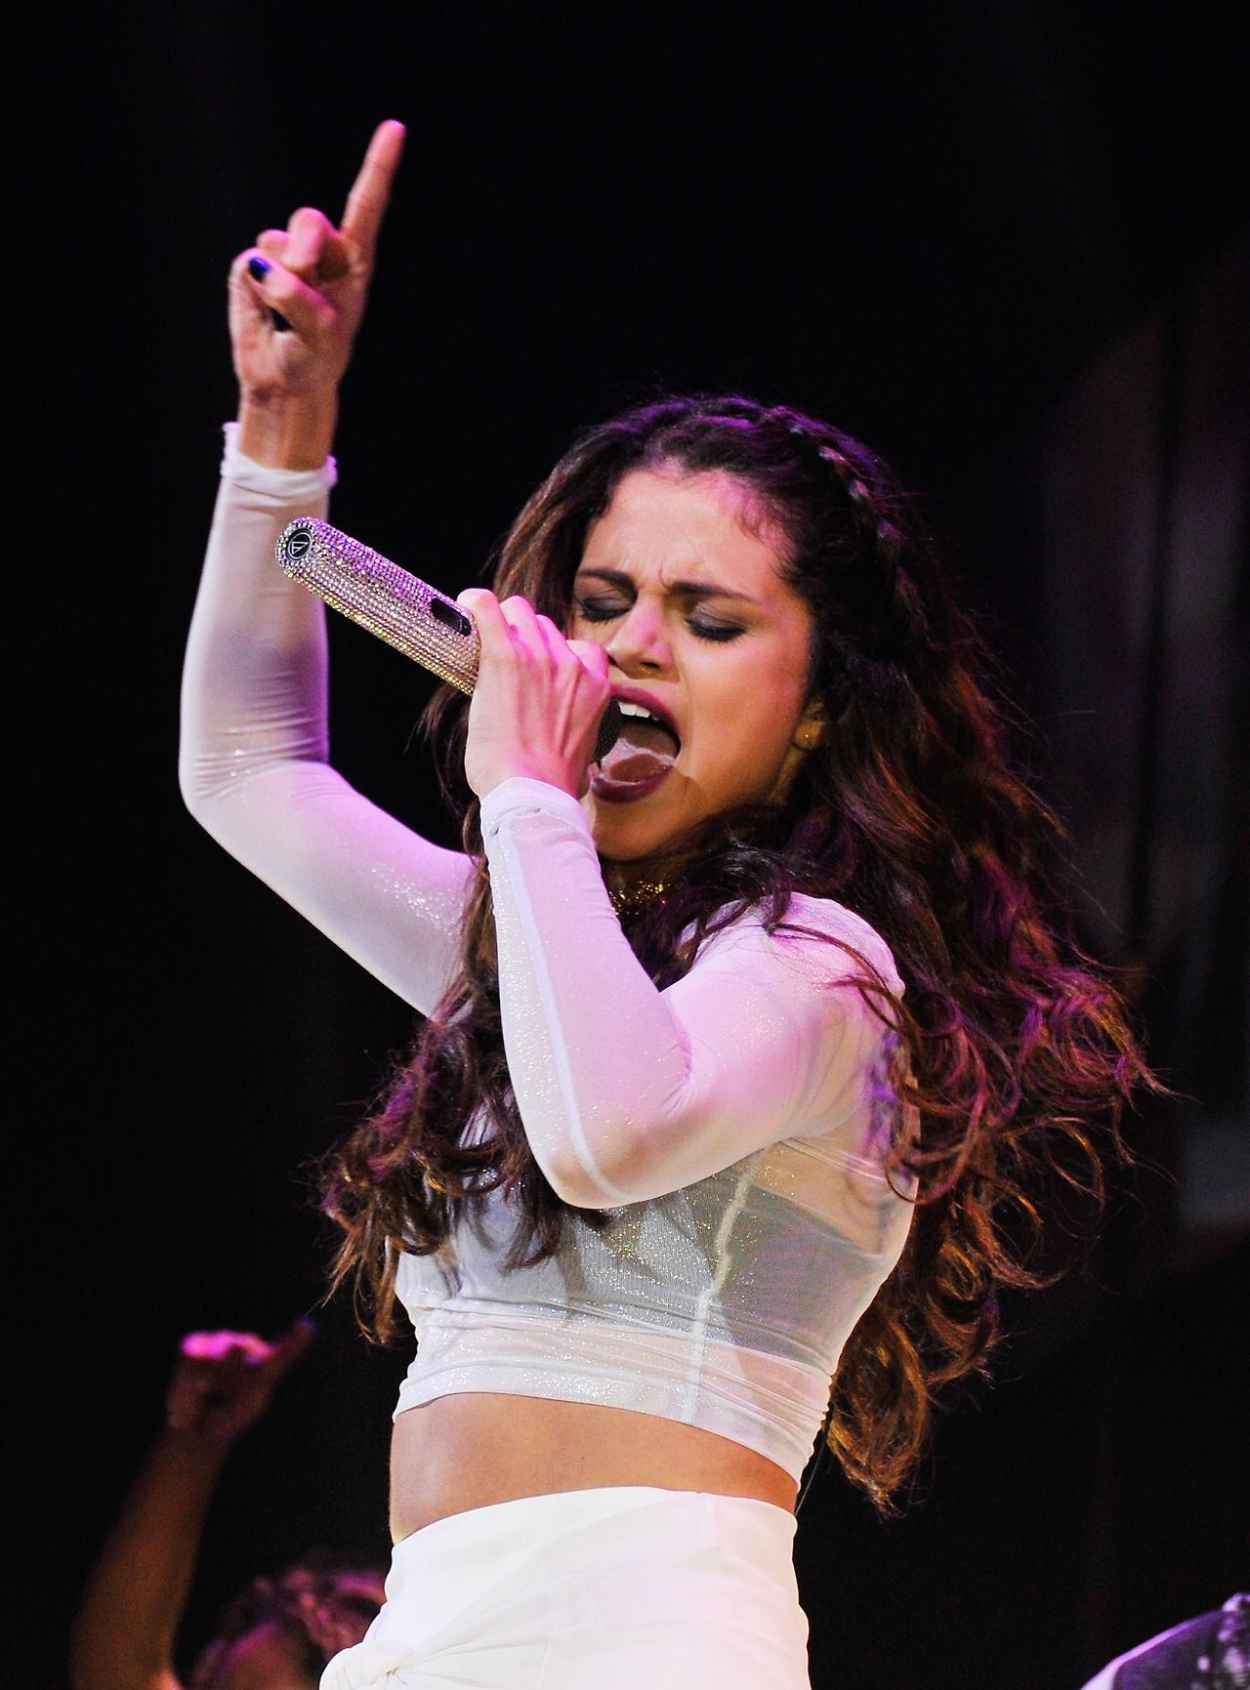 Selena Gomez - Stars Dance Tour performance in Brooklyn-1